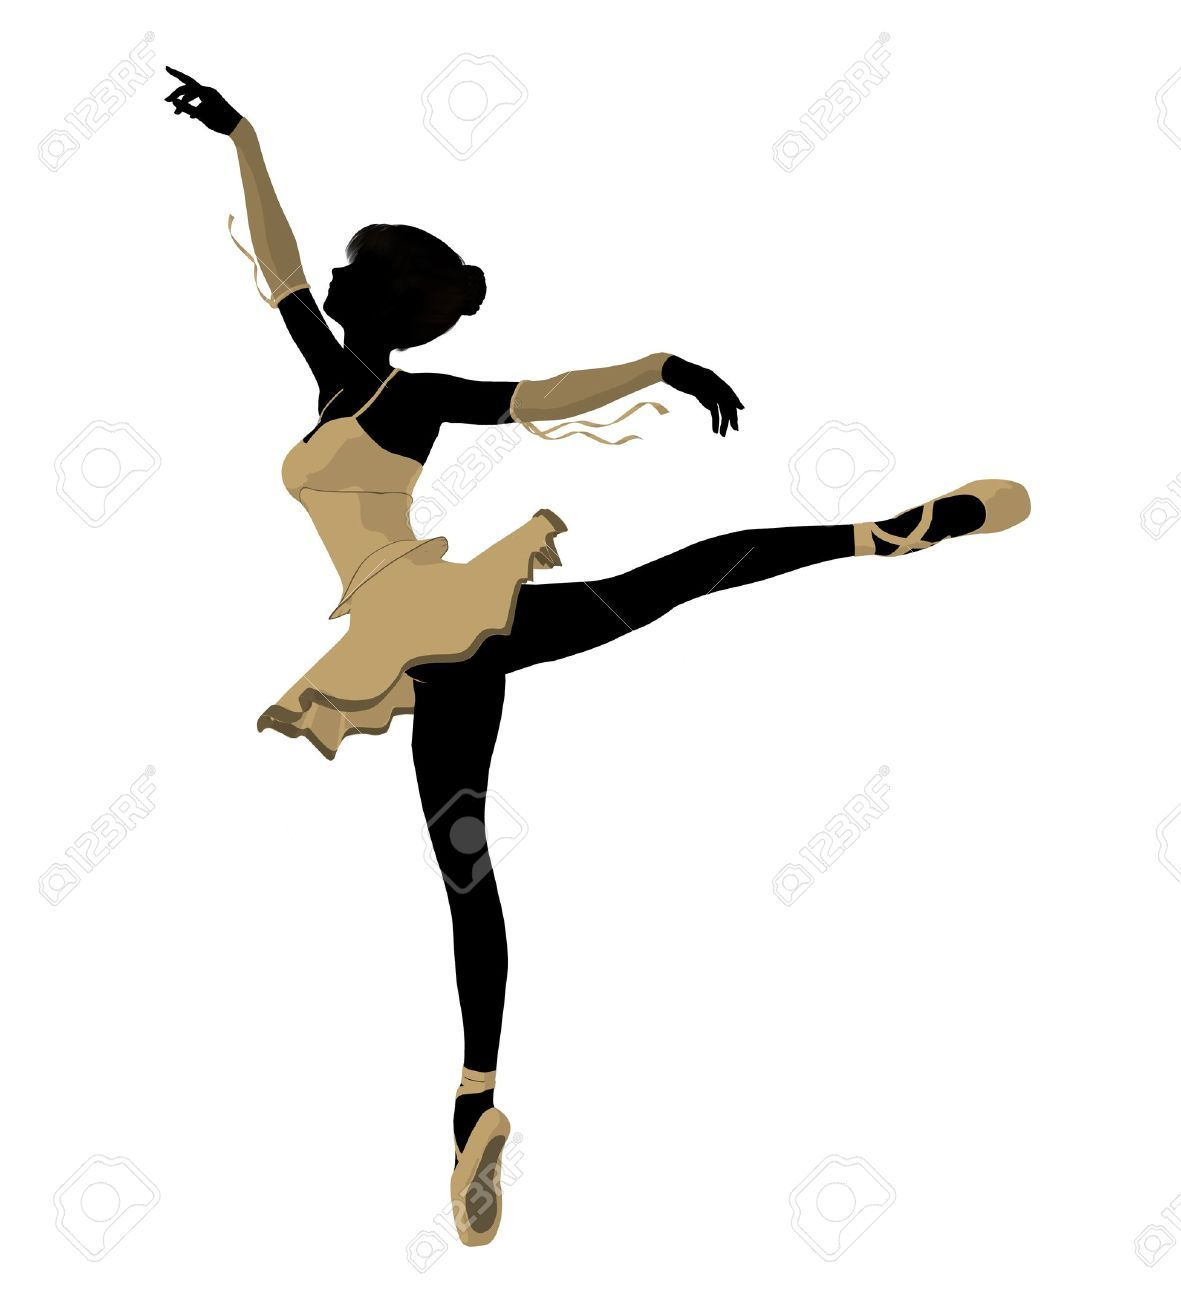 1181x1300 Ballerina Silhouette Ballerina Silhouette On A White Background